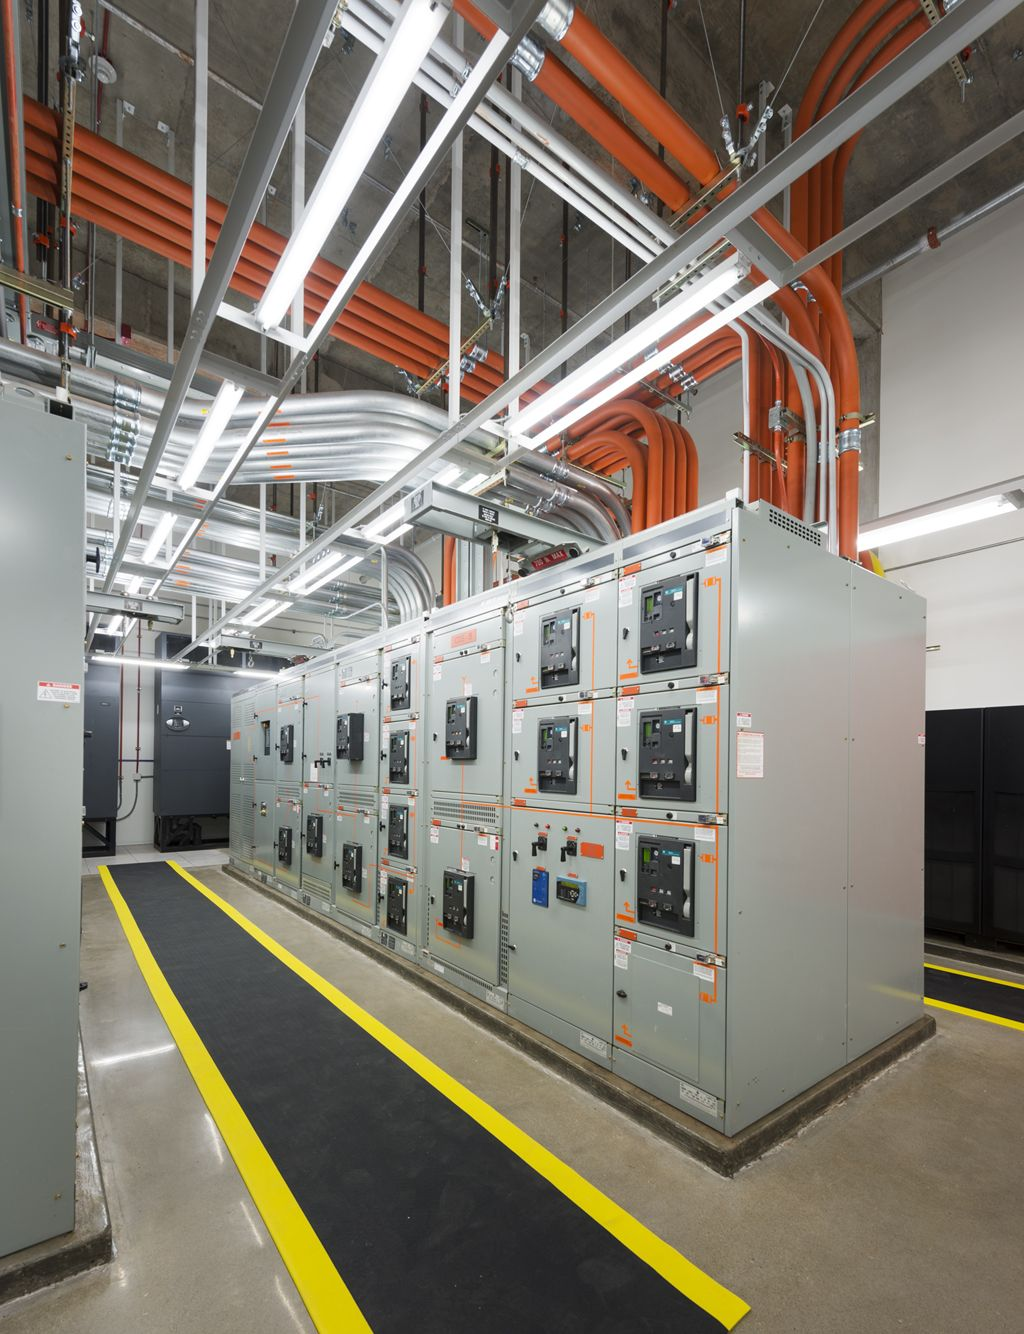 c5138b04dbe2754728225d48cd09bdcb strata space data center google search data center in 2018